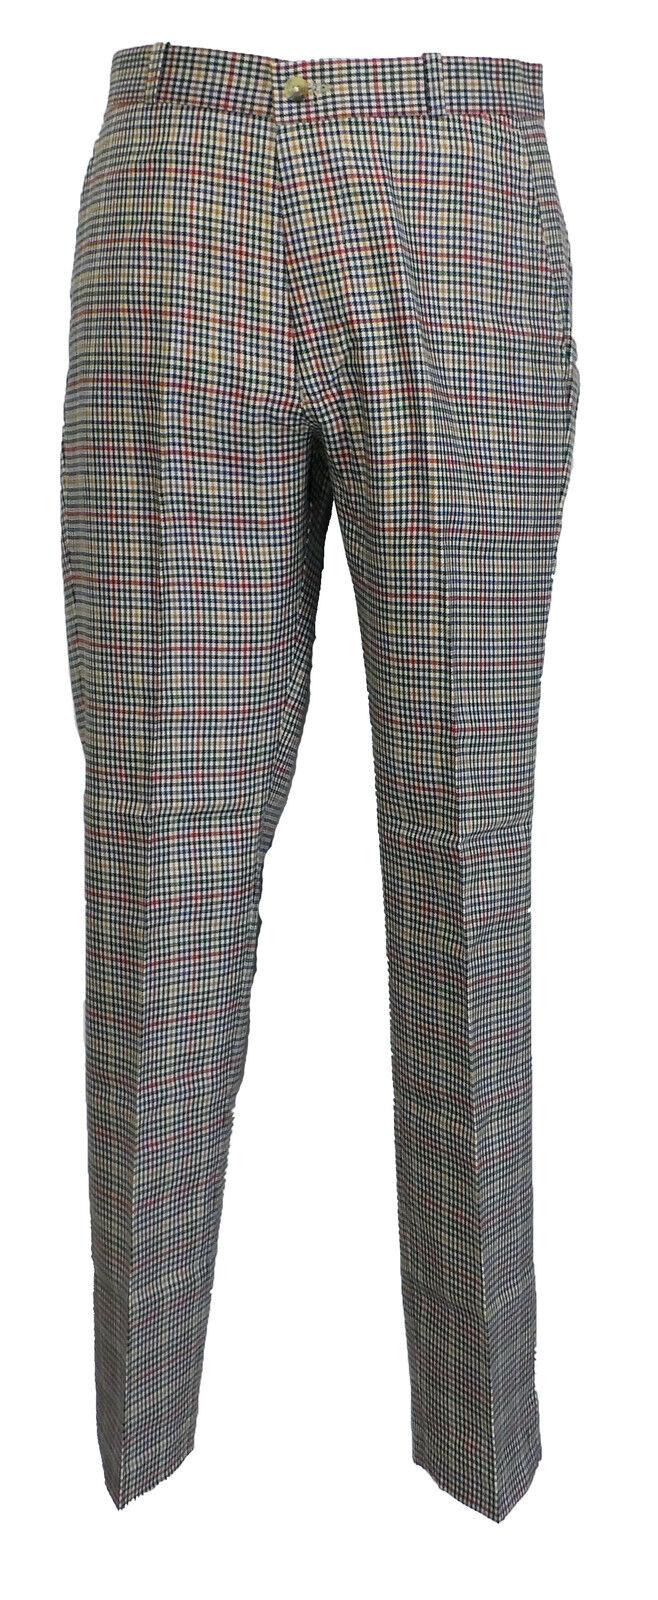 Biege Tweed 60S 70S Retro Mod Vintage Sta Press Trousers